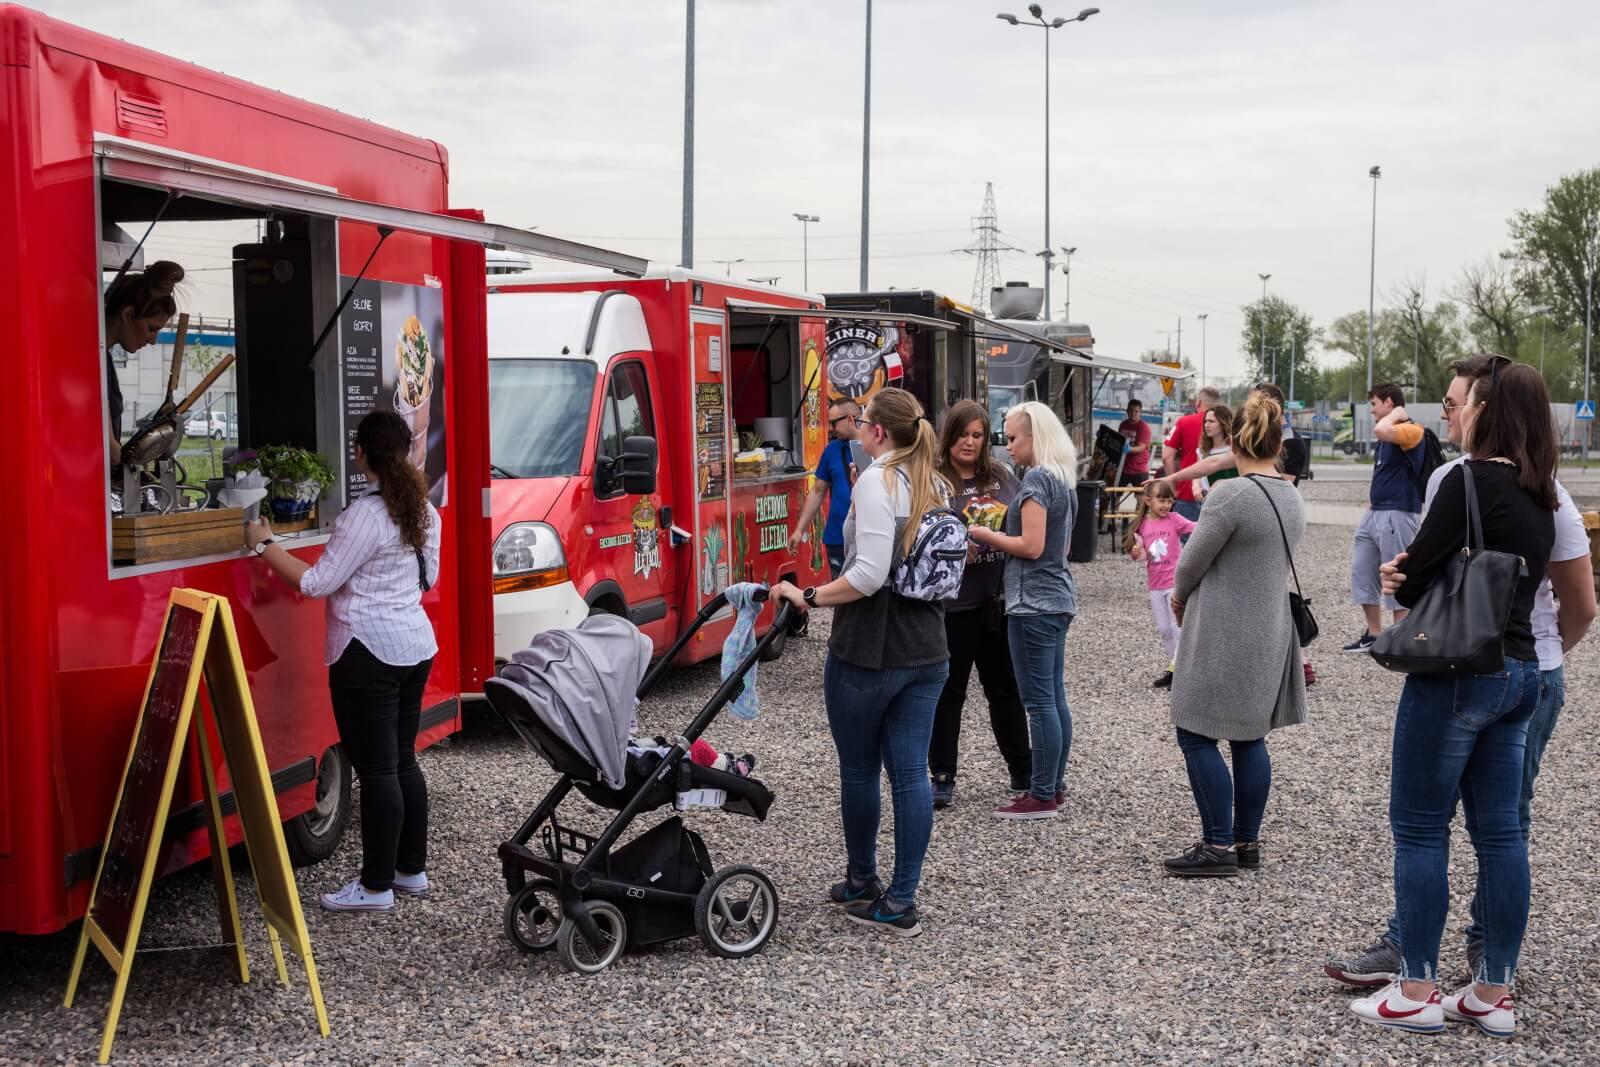 Festiwal foodtrucków w Lublinie fot. PAP/Wojtek Jargiło